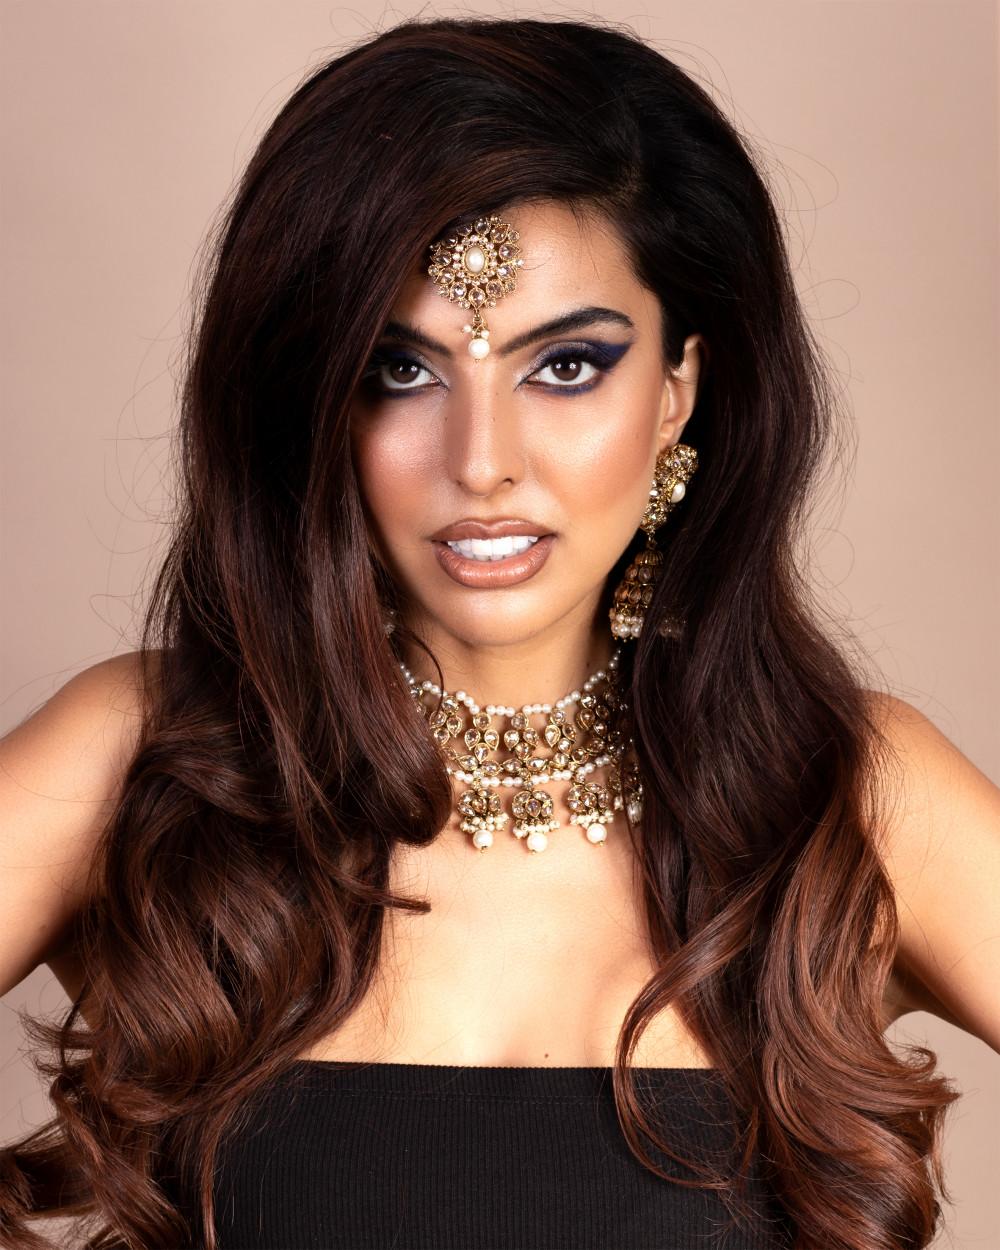 Beautiful Indian Bride  Makeup by me Hair by Nicola from Bespoke Bridal Hair   Www.bespokebridalhair.co.uk - Make Me Bridal Artist: Rosie Cerosio Makeup. Photography by: Jasmine Boulton. #indianbride #glambride #beautifulbridalmakeup